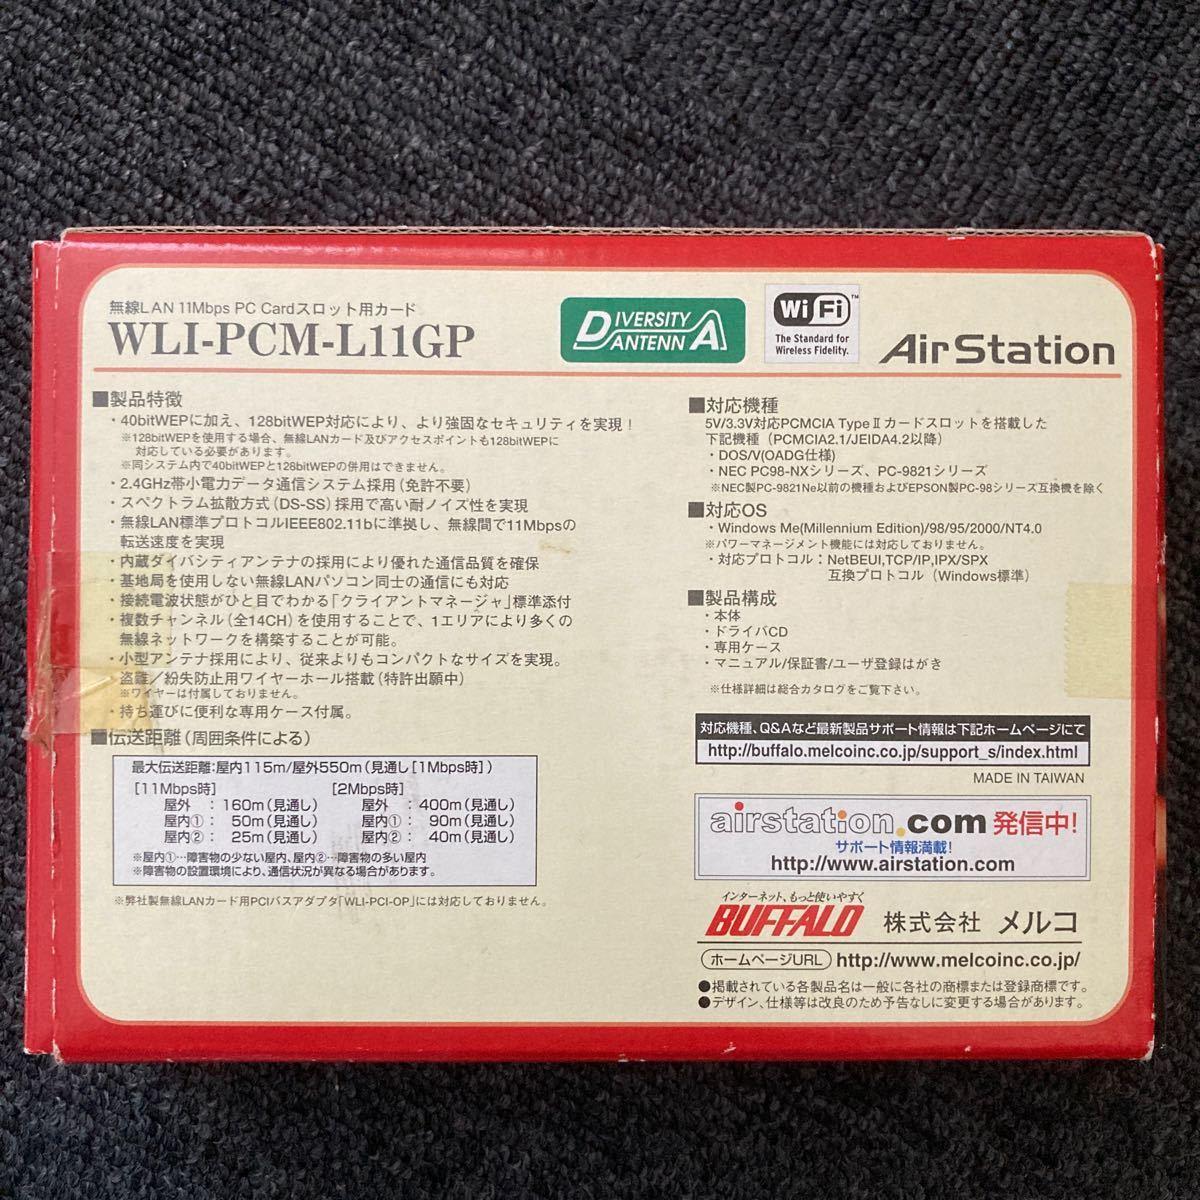 BUFFALO 無線LANカード PCカードアダプター CR-5 PC Card Air Station